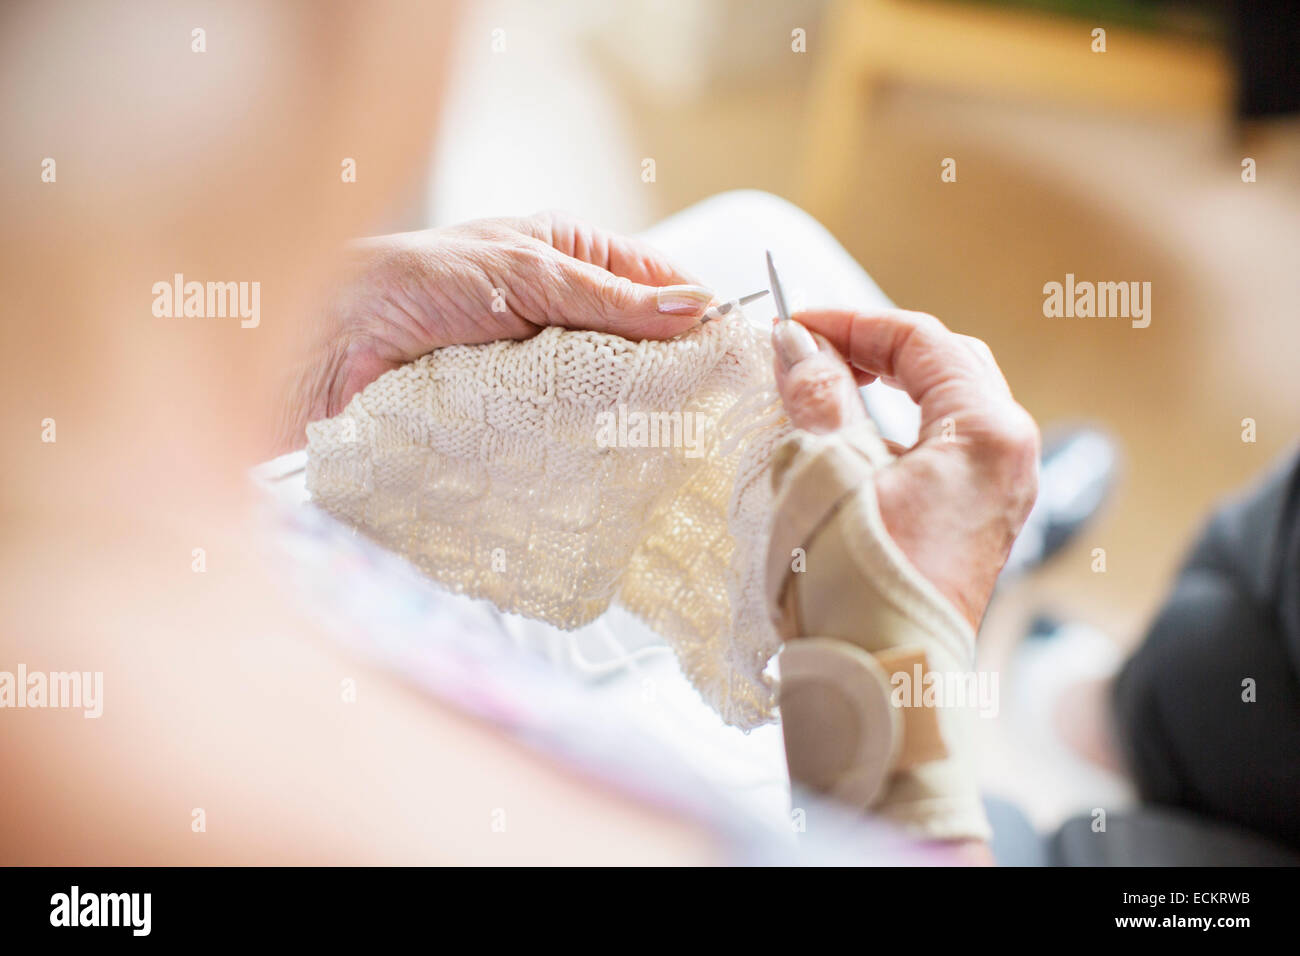 Cropped image of senior woman knitting at nursing home - Stock Image